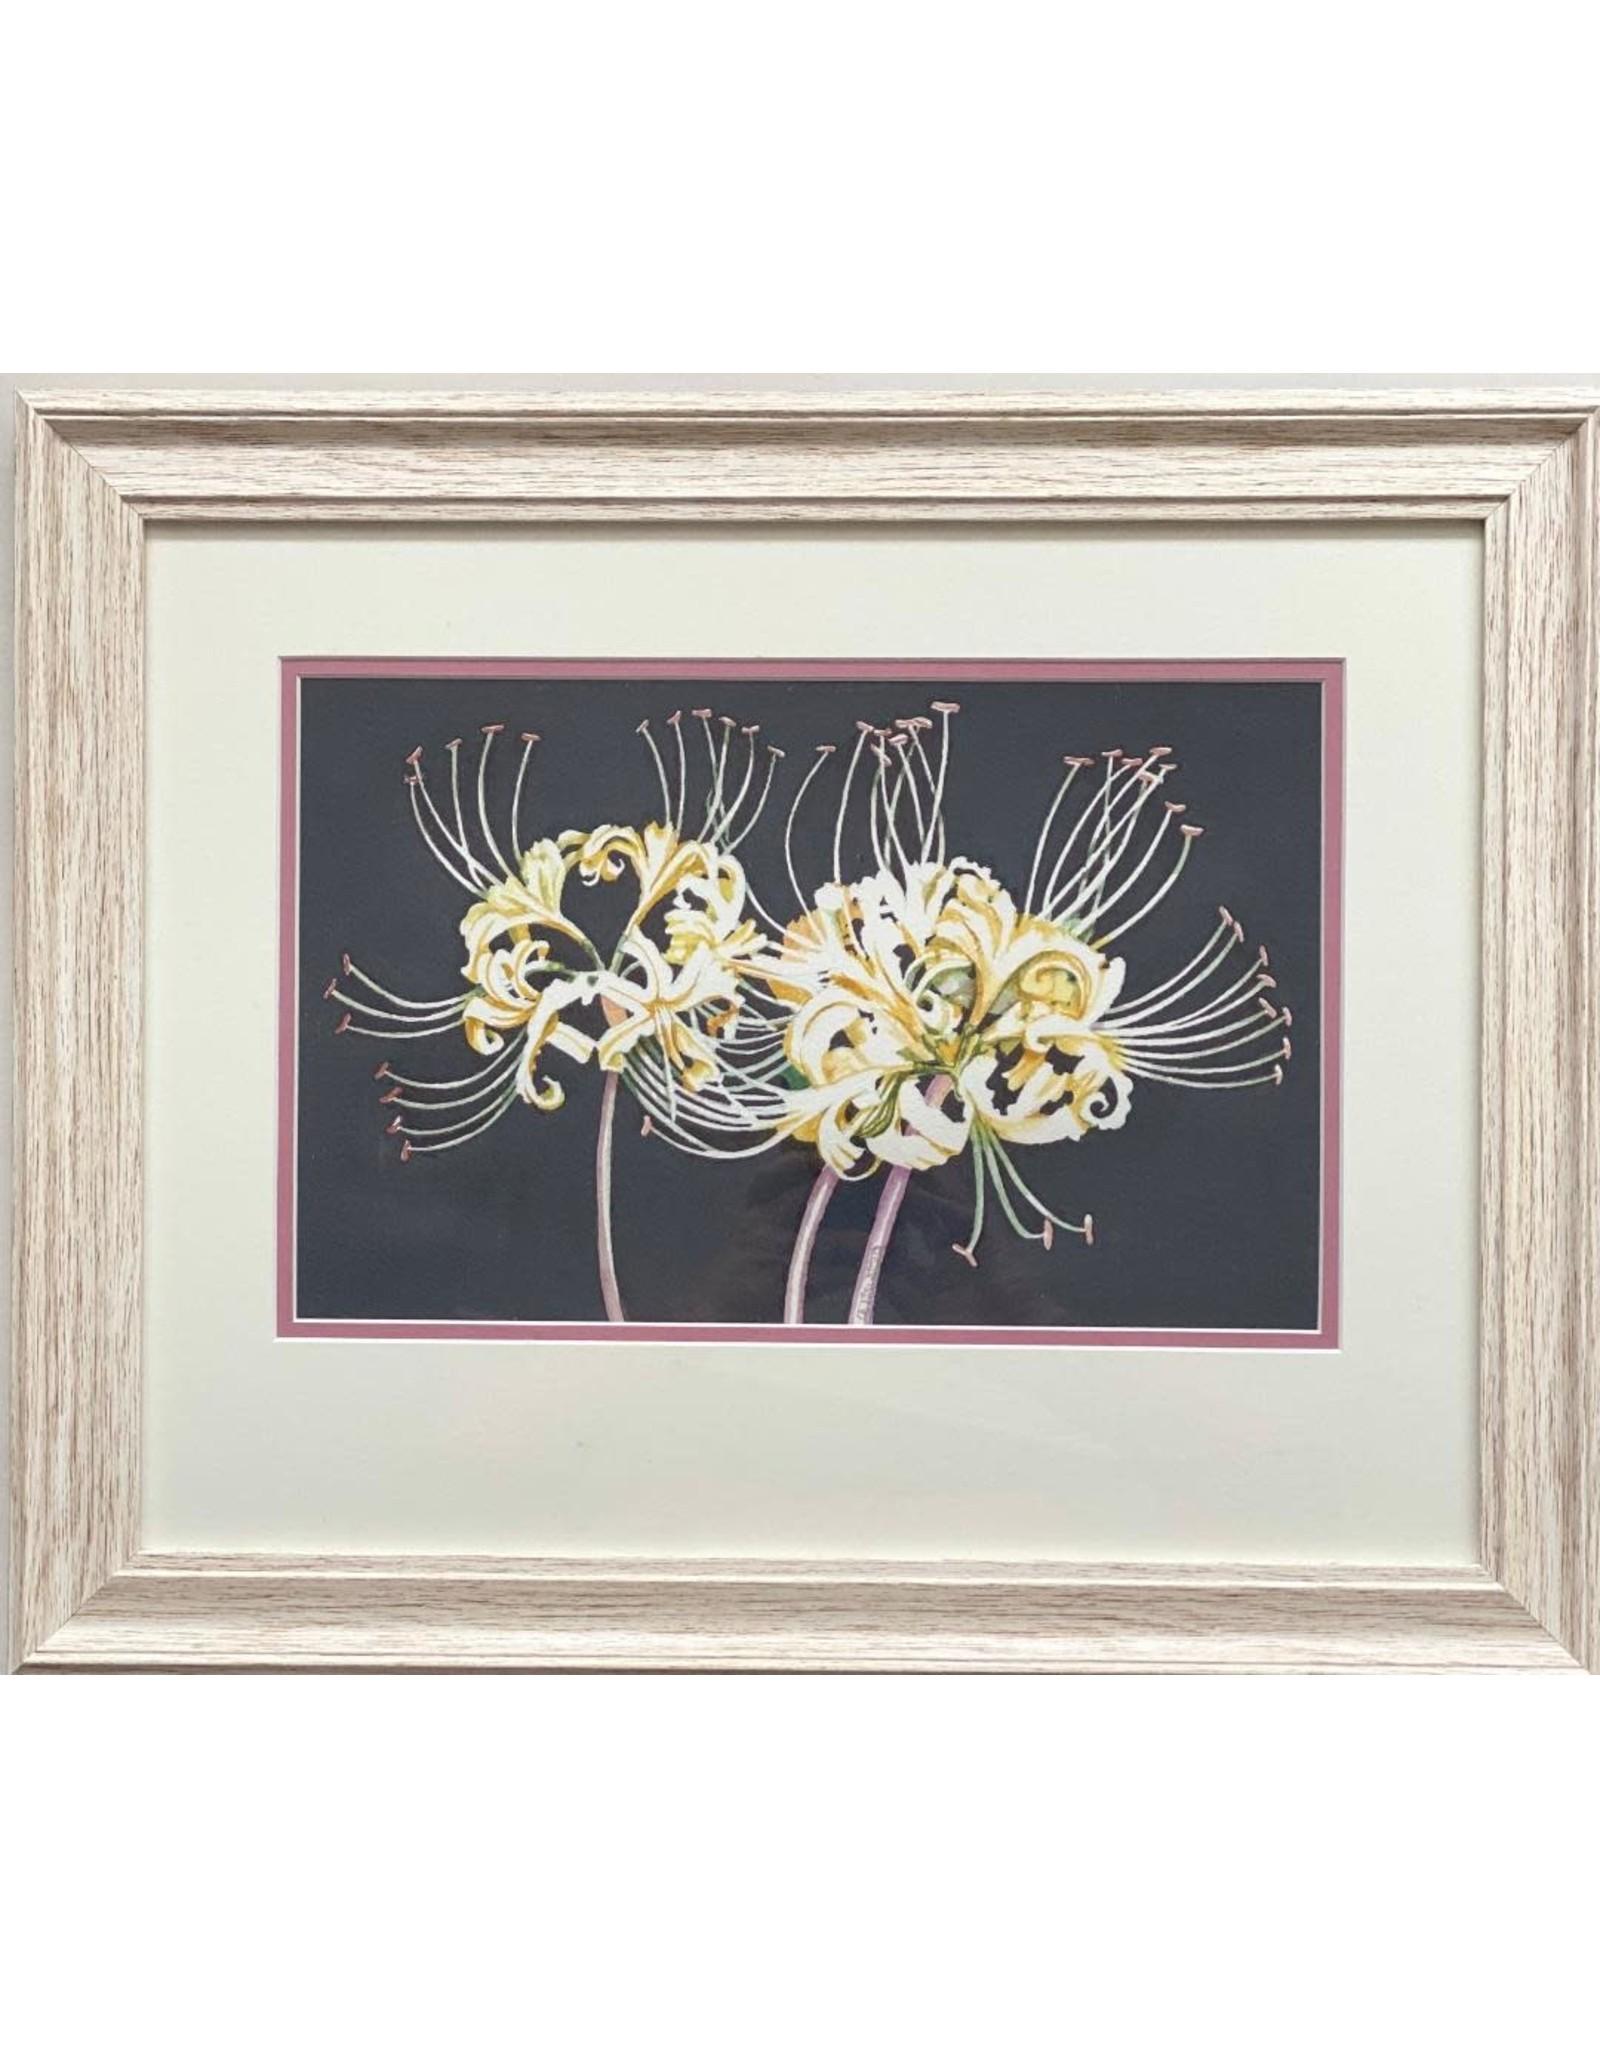 Alice Tersteeg White Spider Lily (framed original) | Alice Tersteeg